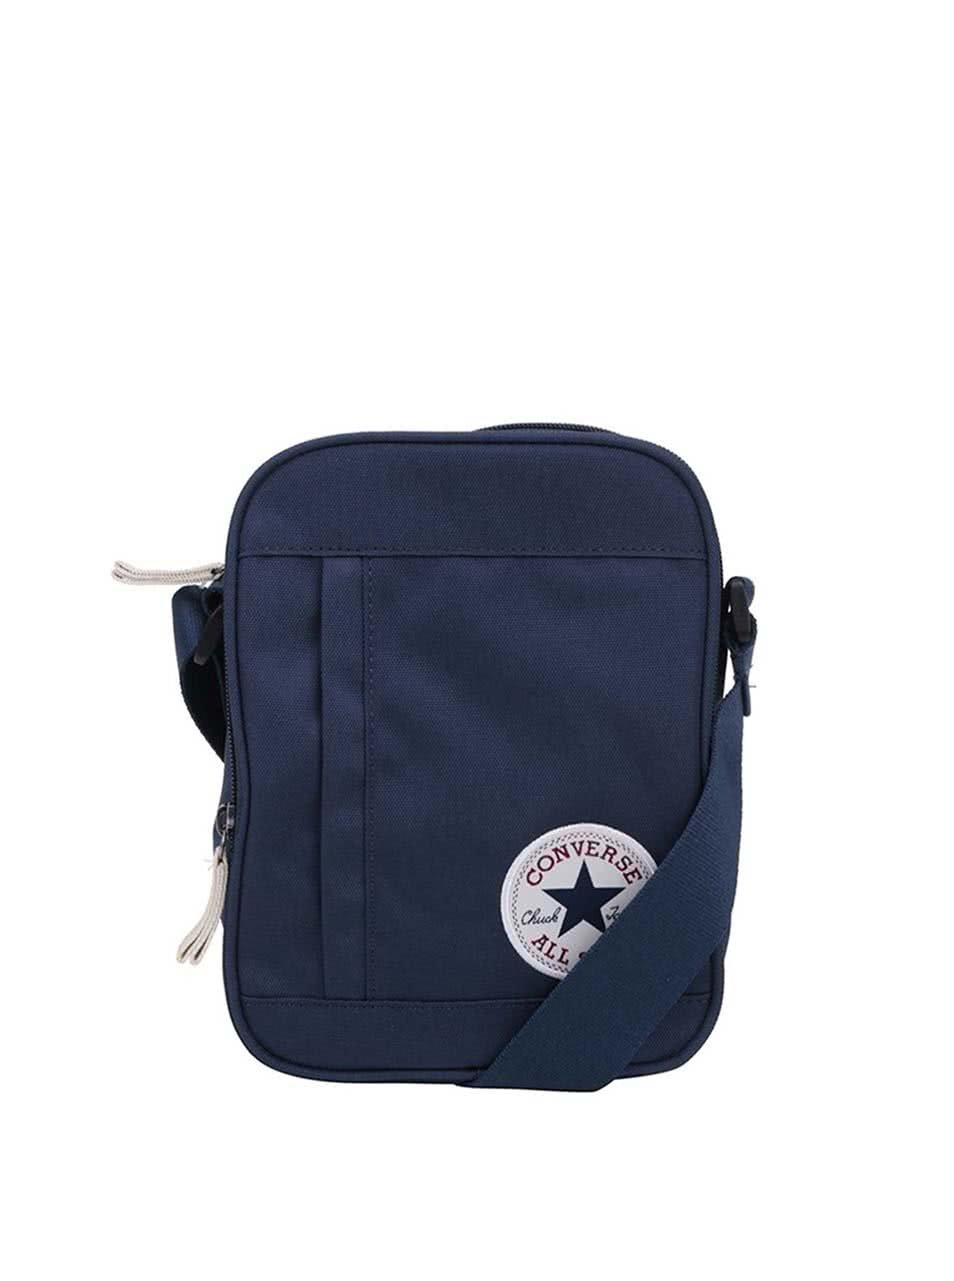 Tmavě modrá unisex taška Converse Poly Cross Body ... 014c3116f1